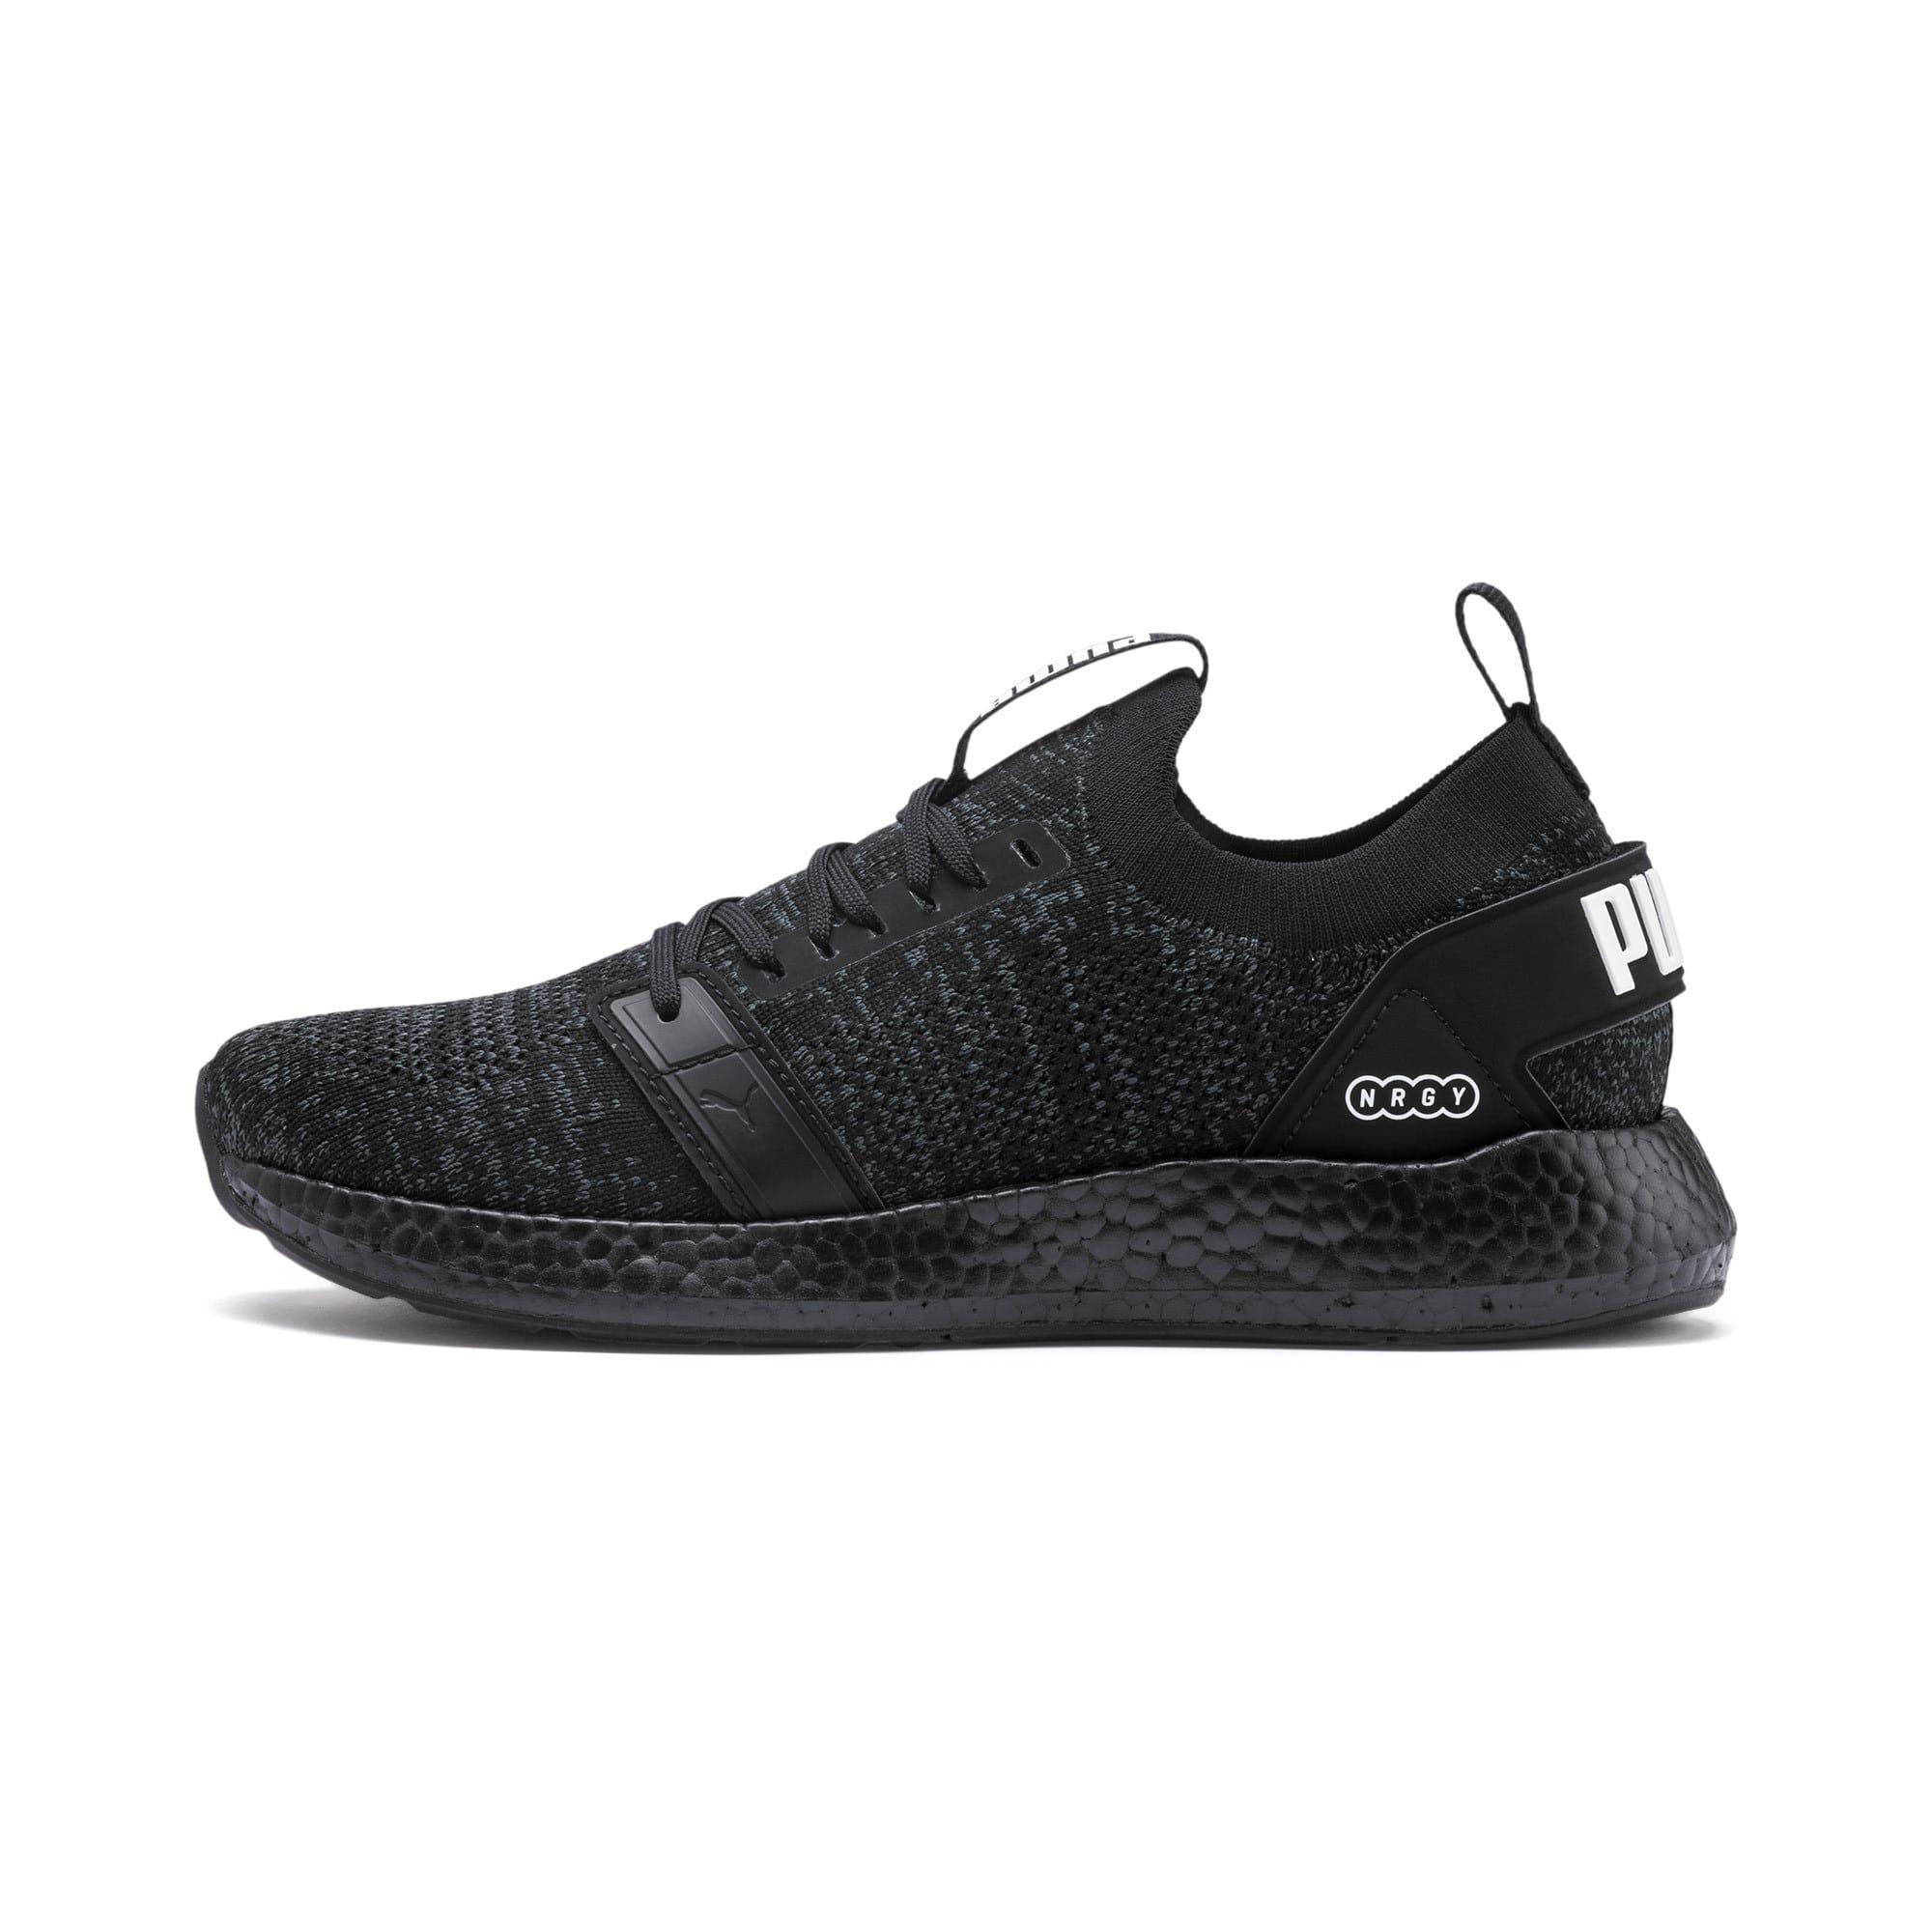 Thumbnail 1 of NRGY Neko Engineer Knit Women's Running Shoes, Puma Black-Puma Black, medium